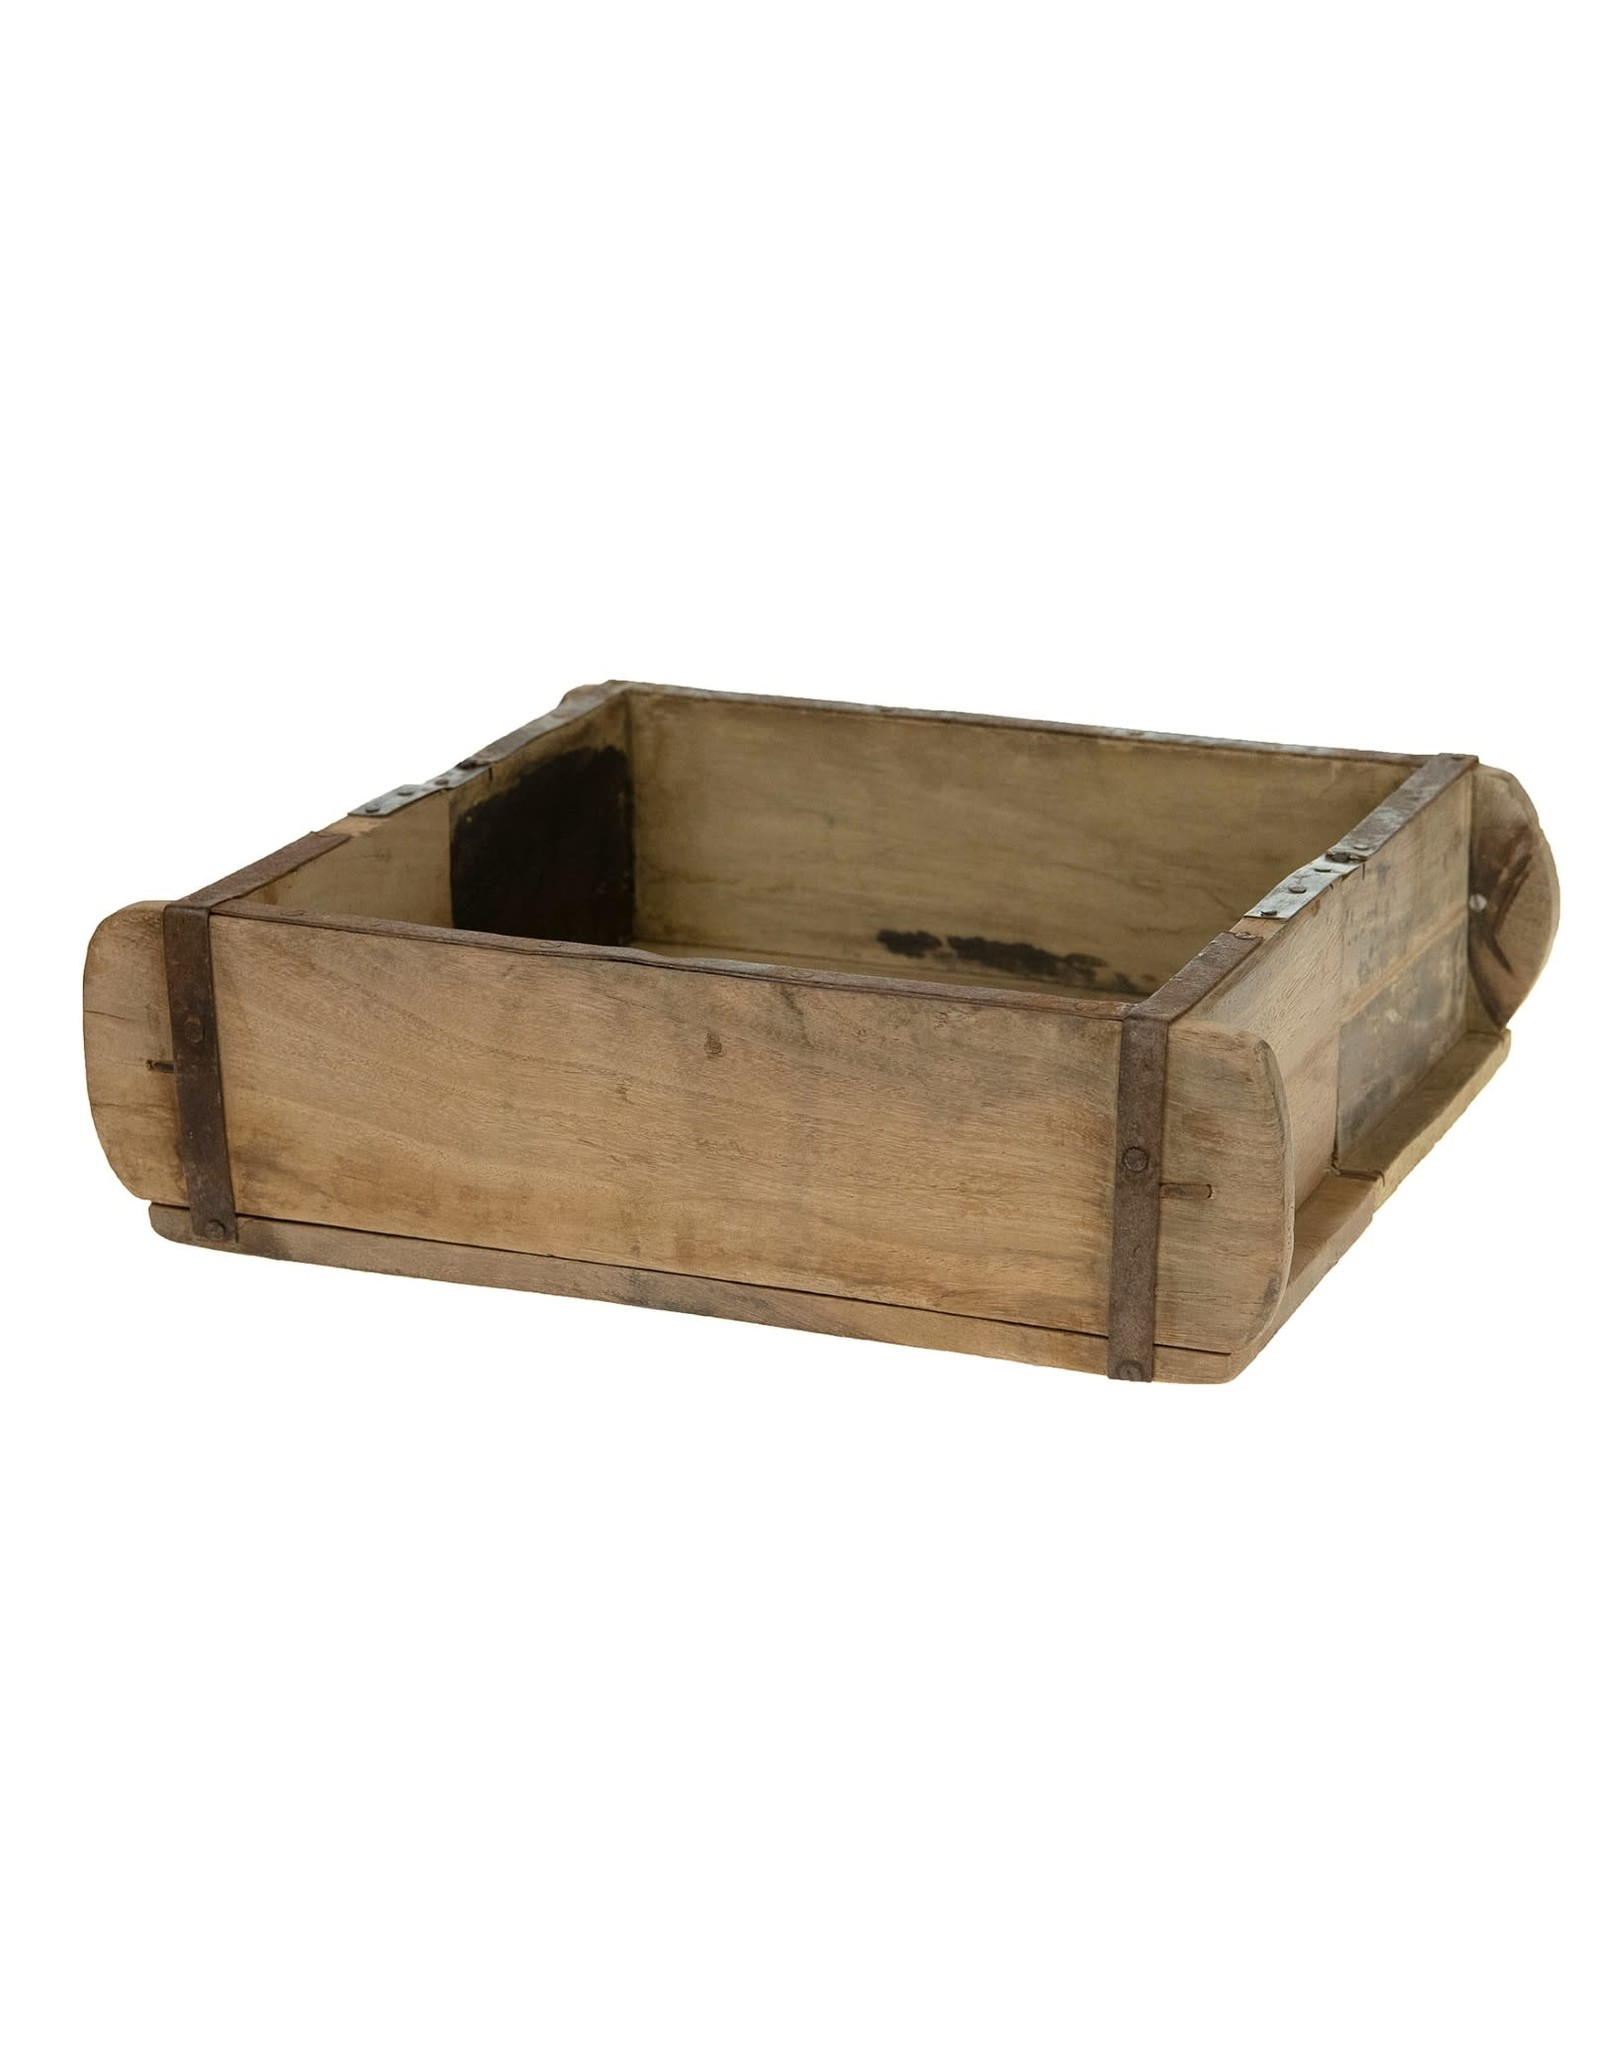 Dijk Brick Mould Large Recycled Wood 31x23x10cm